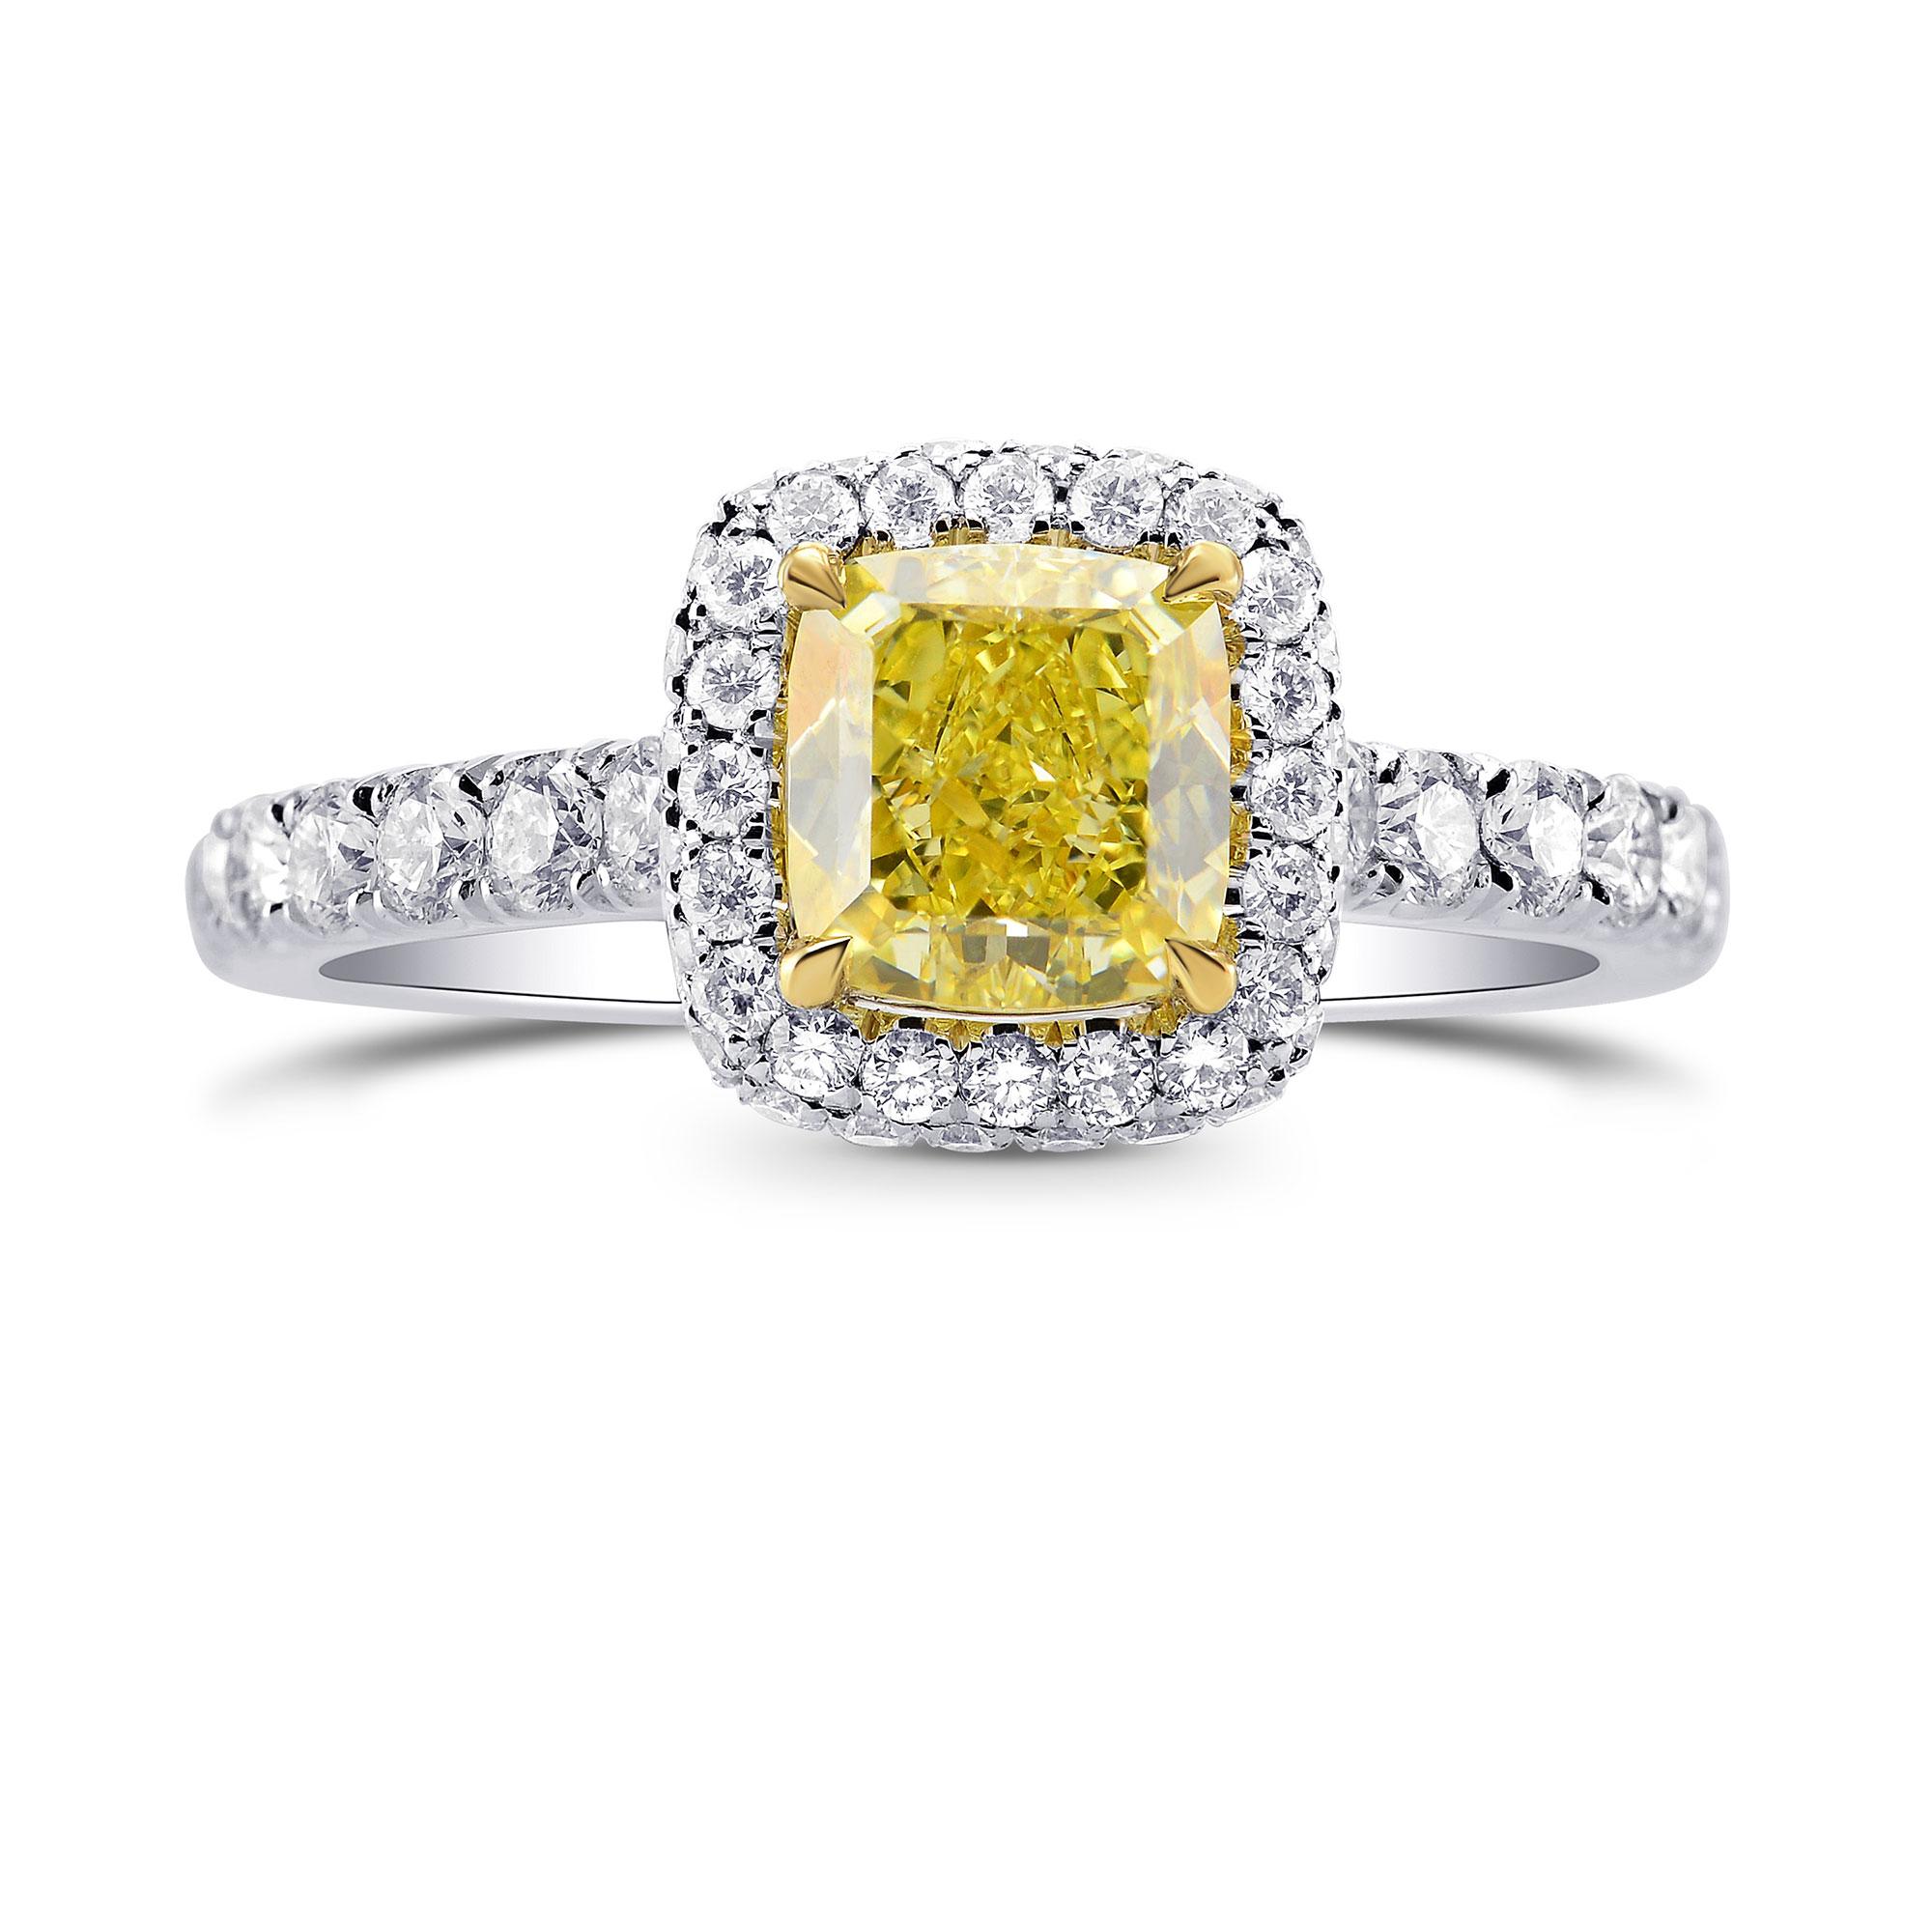 Fancy Yellow Cushion Diamond Ring, SKU 280688 (1.73Ct TW)